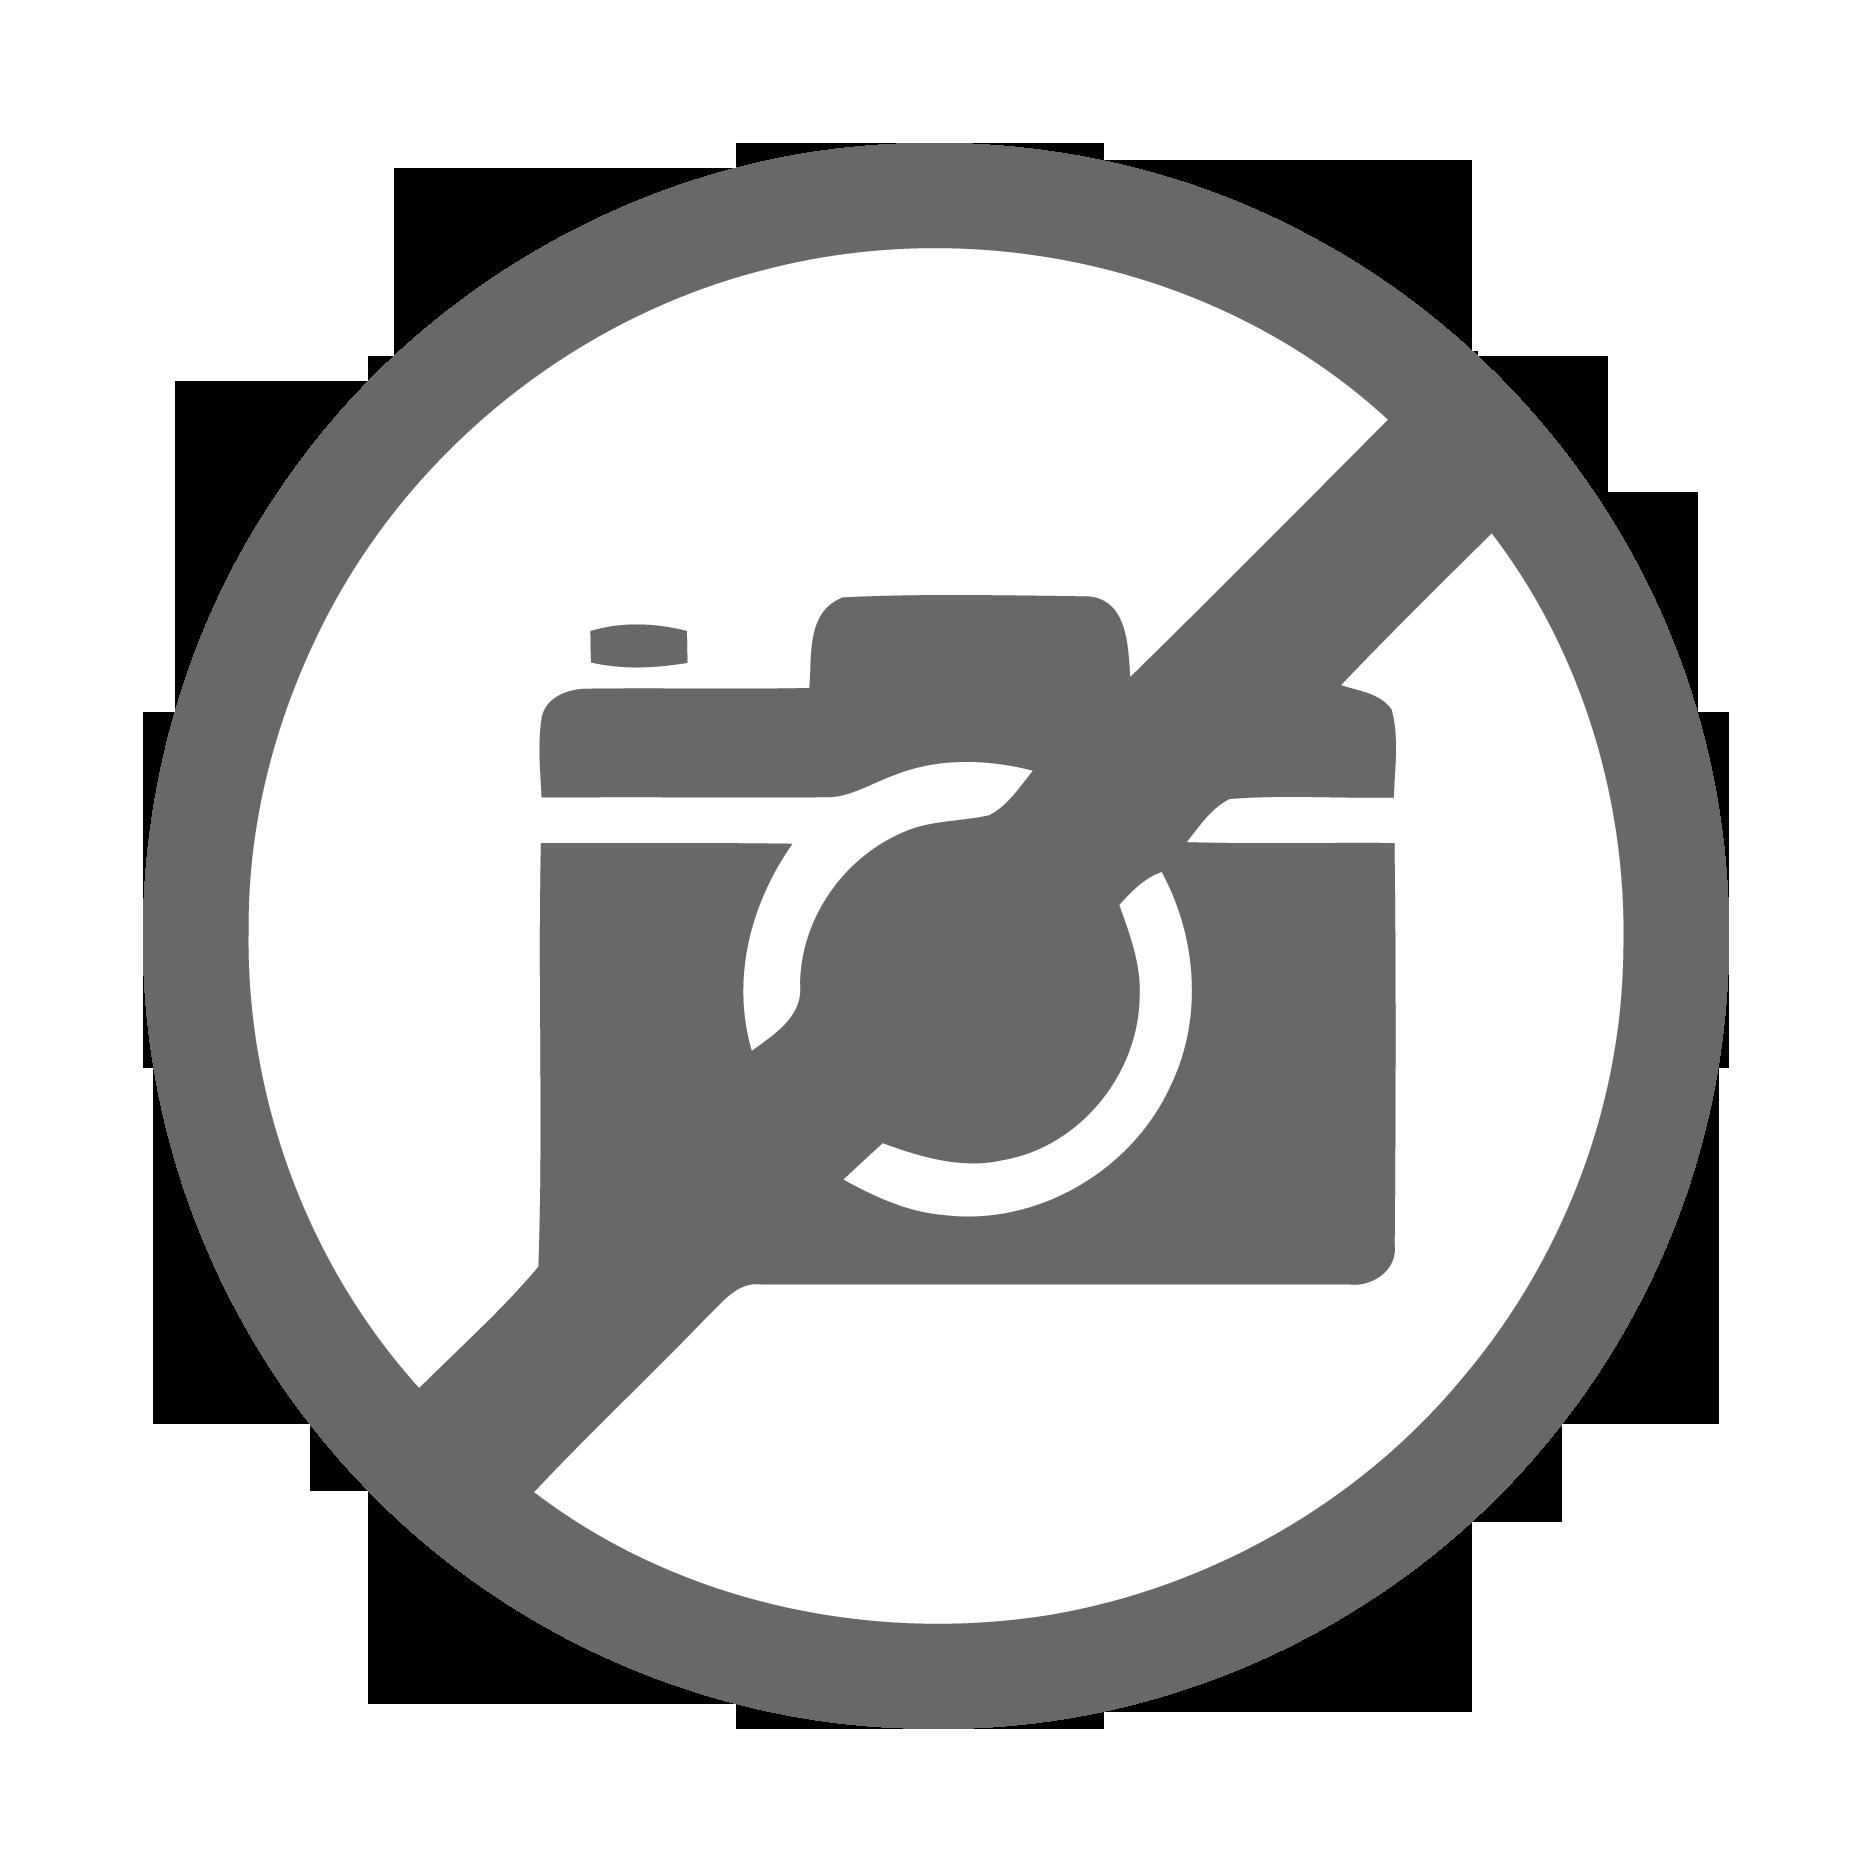 Ефирна пола с висока талия и златен кант